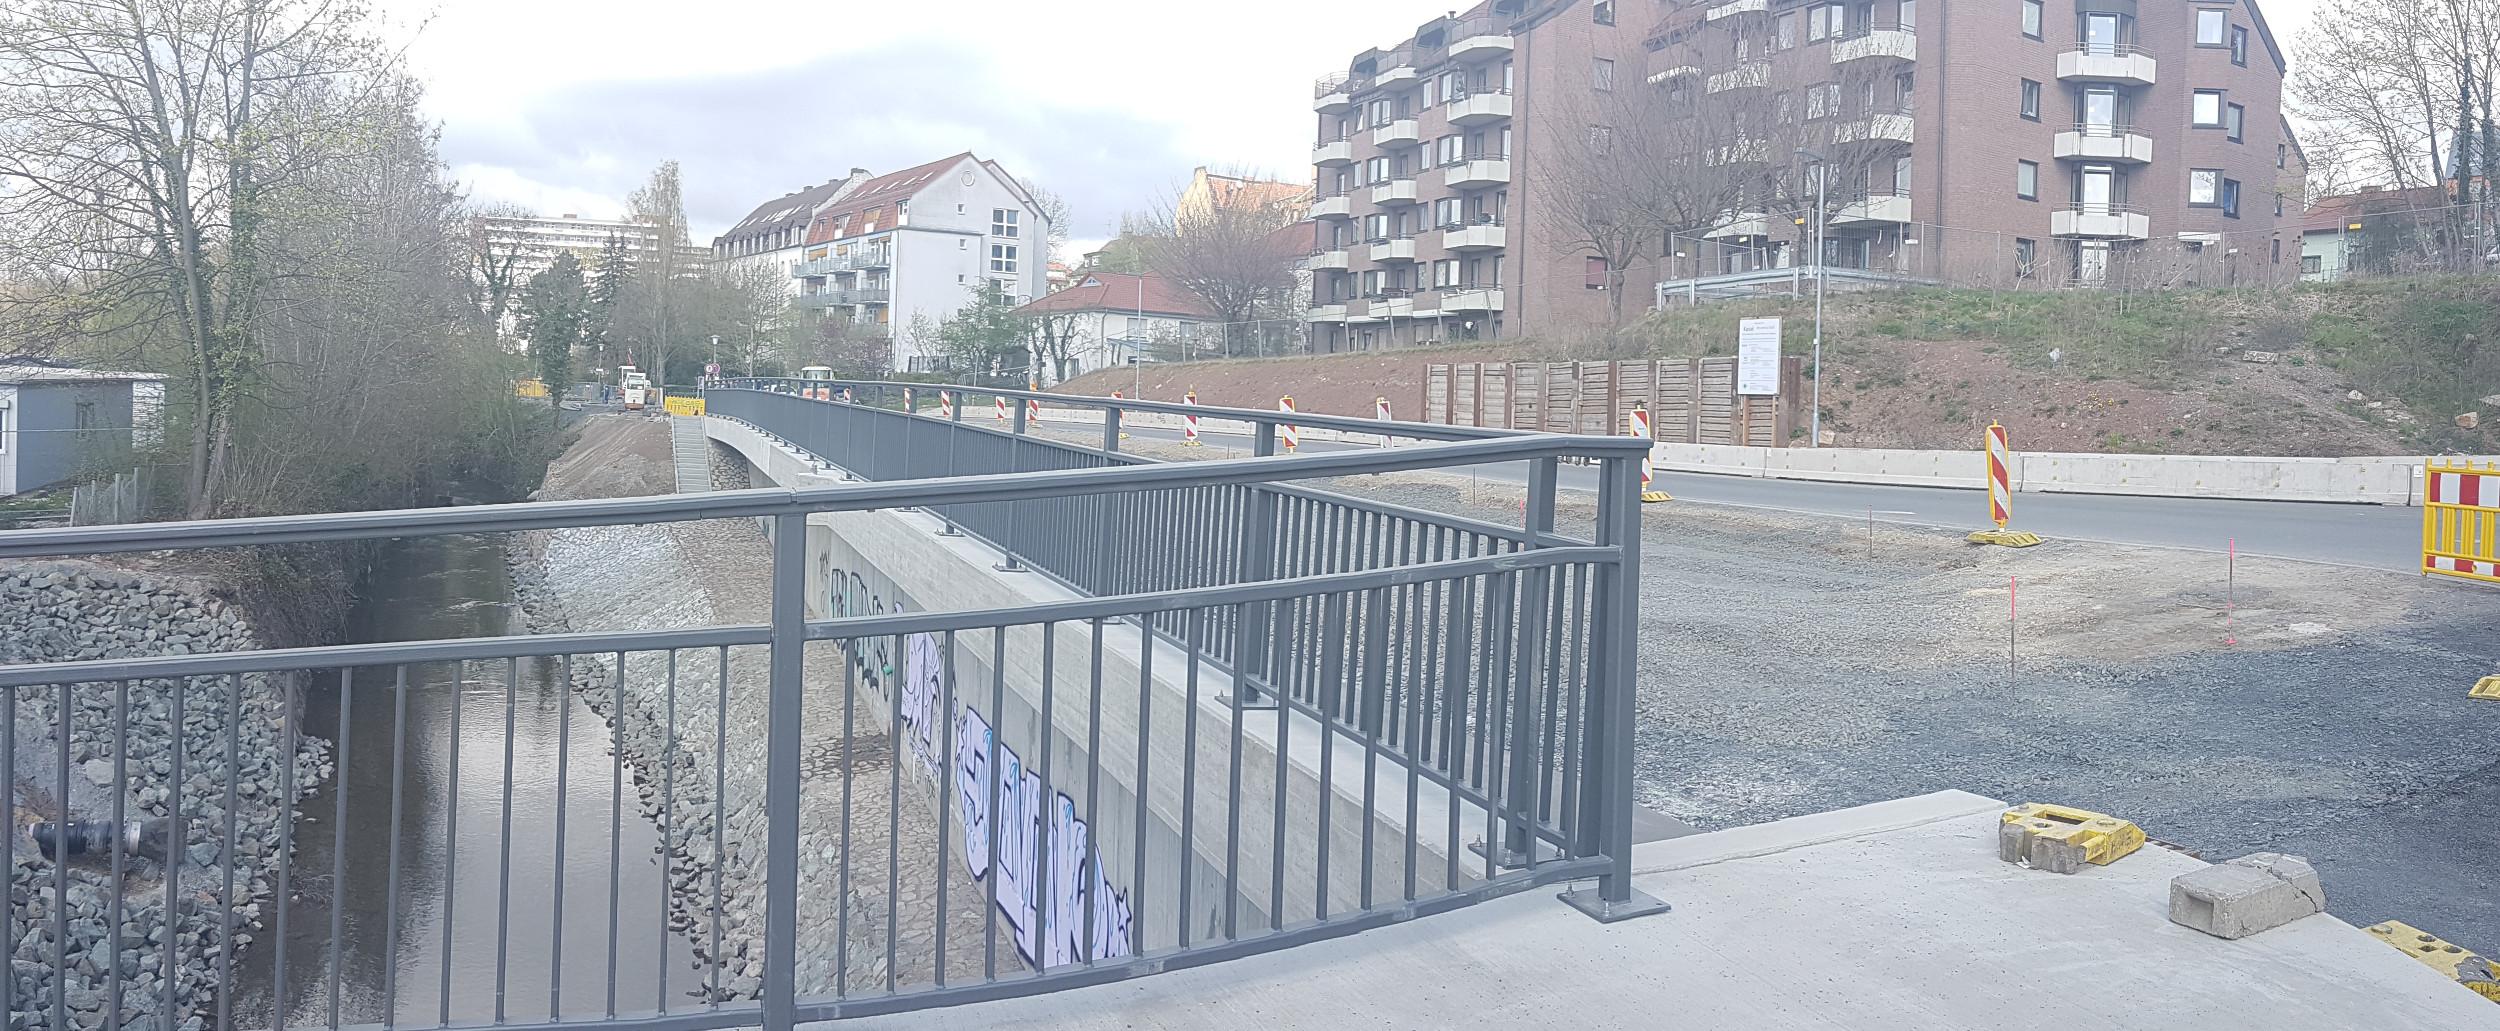 Stützwand-Kassel-Liebigstraße